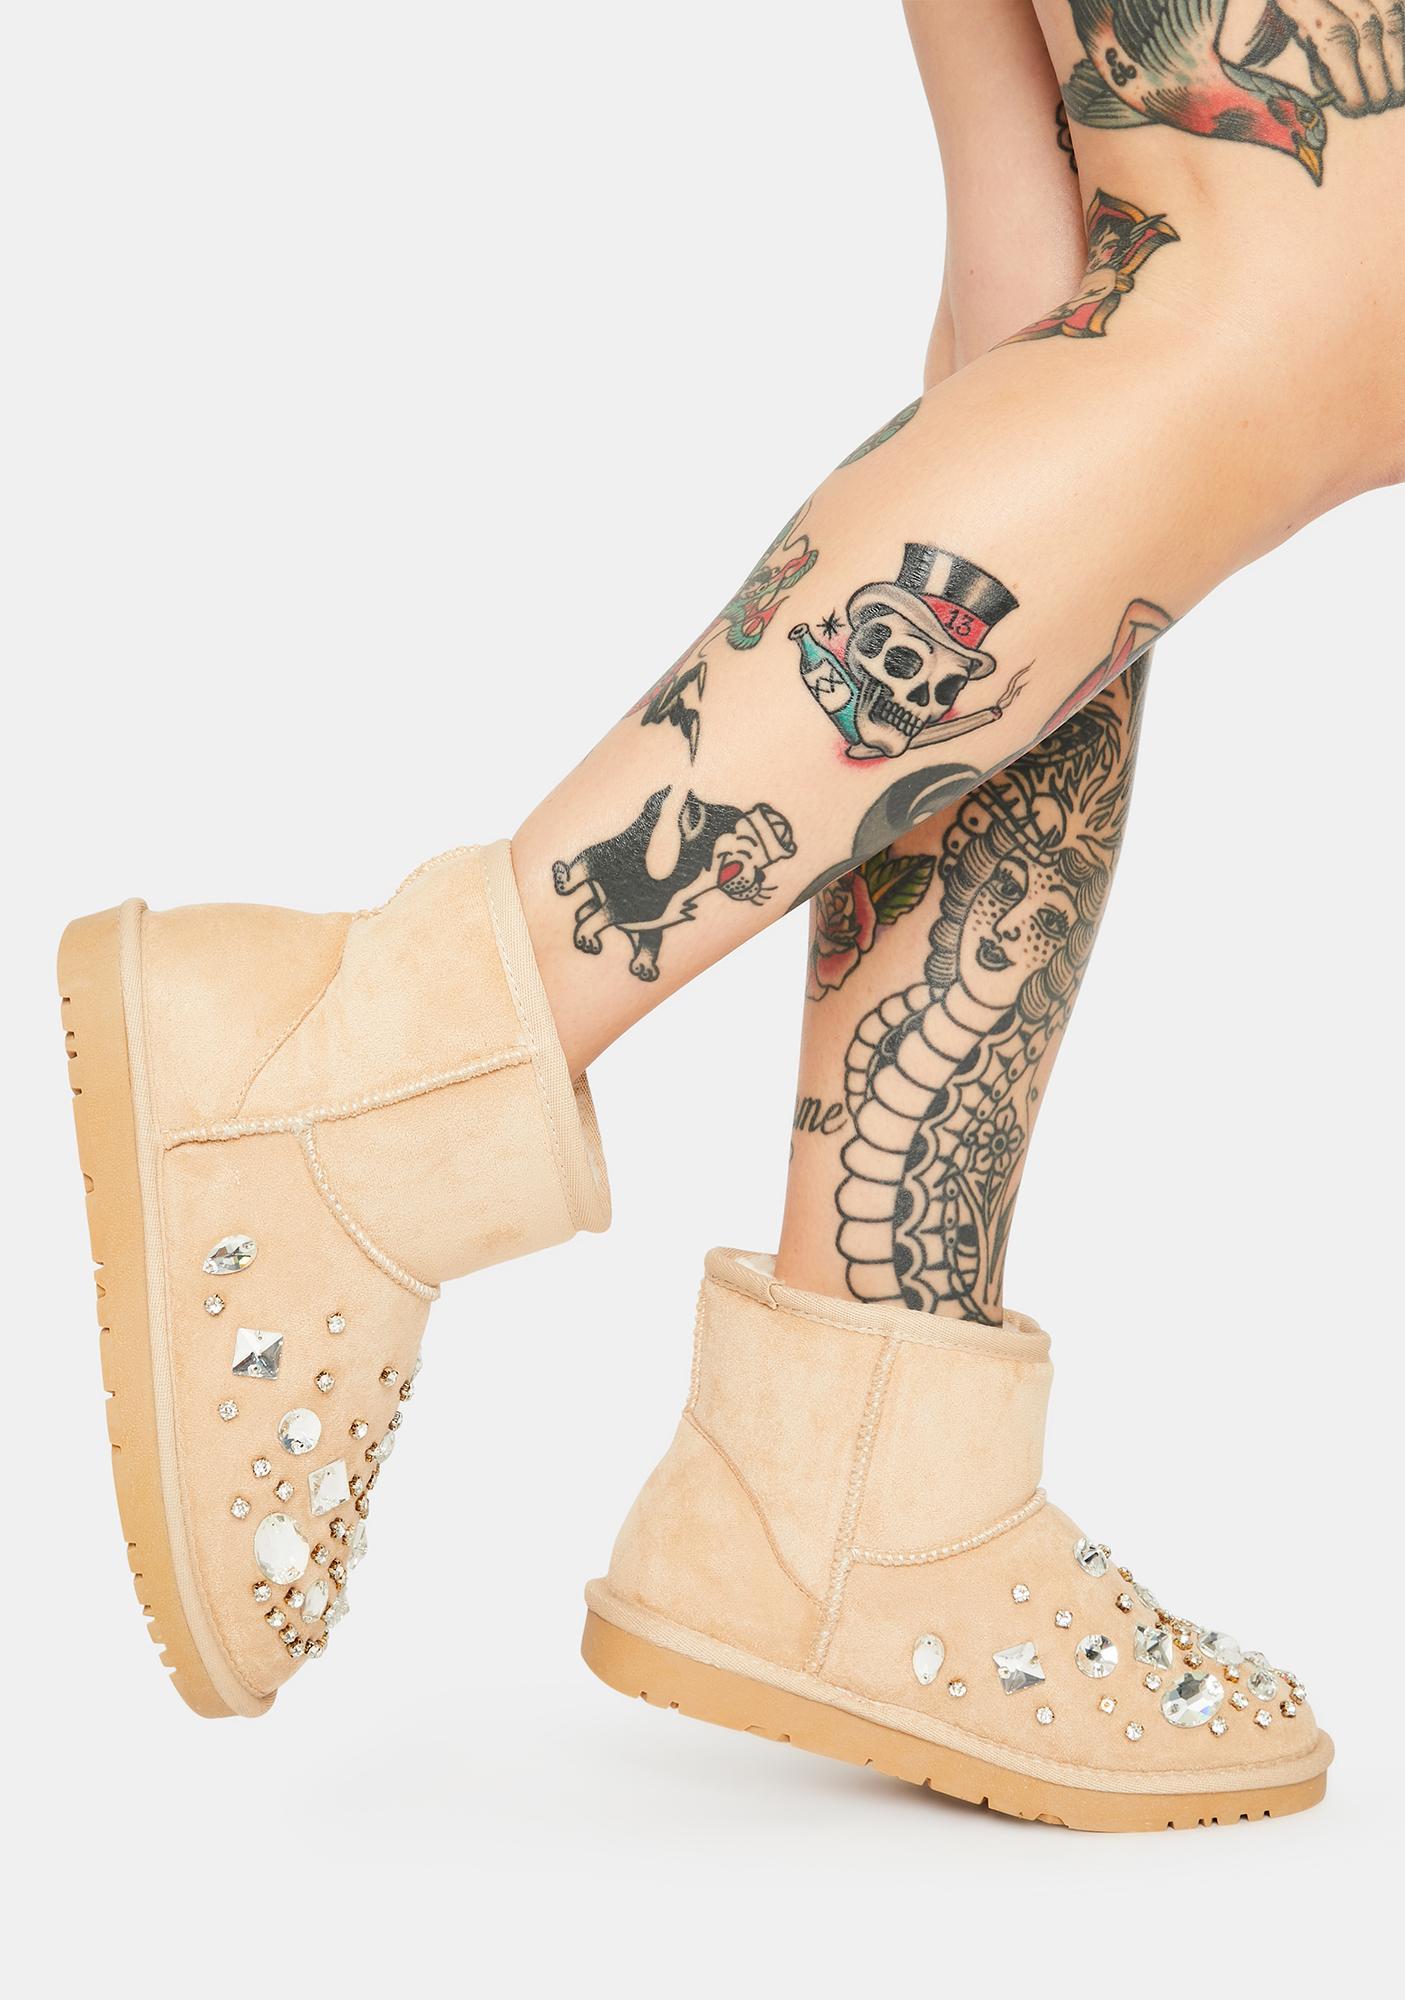 AZALEA WANG Nude Cheyenne Rhinestone Ankle Boots